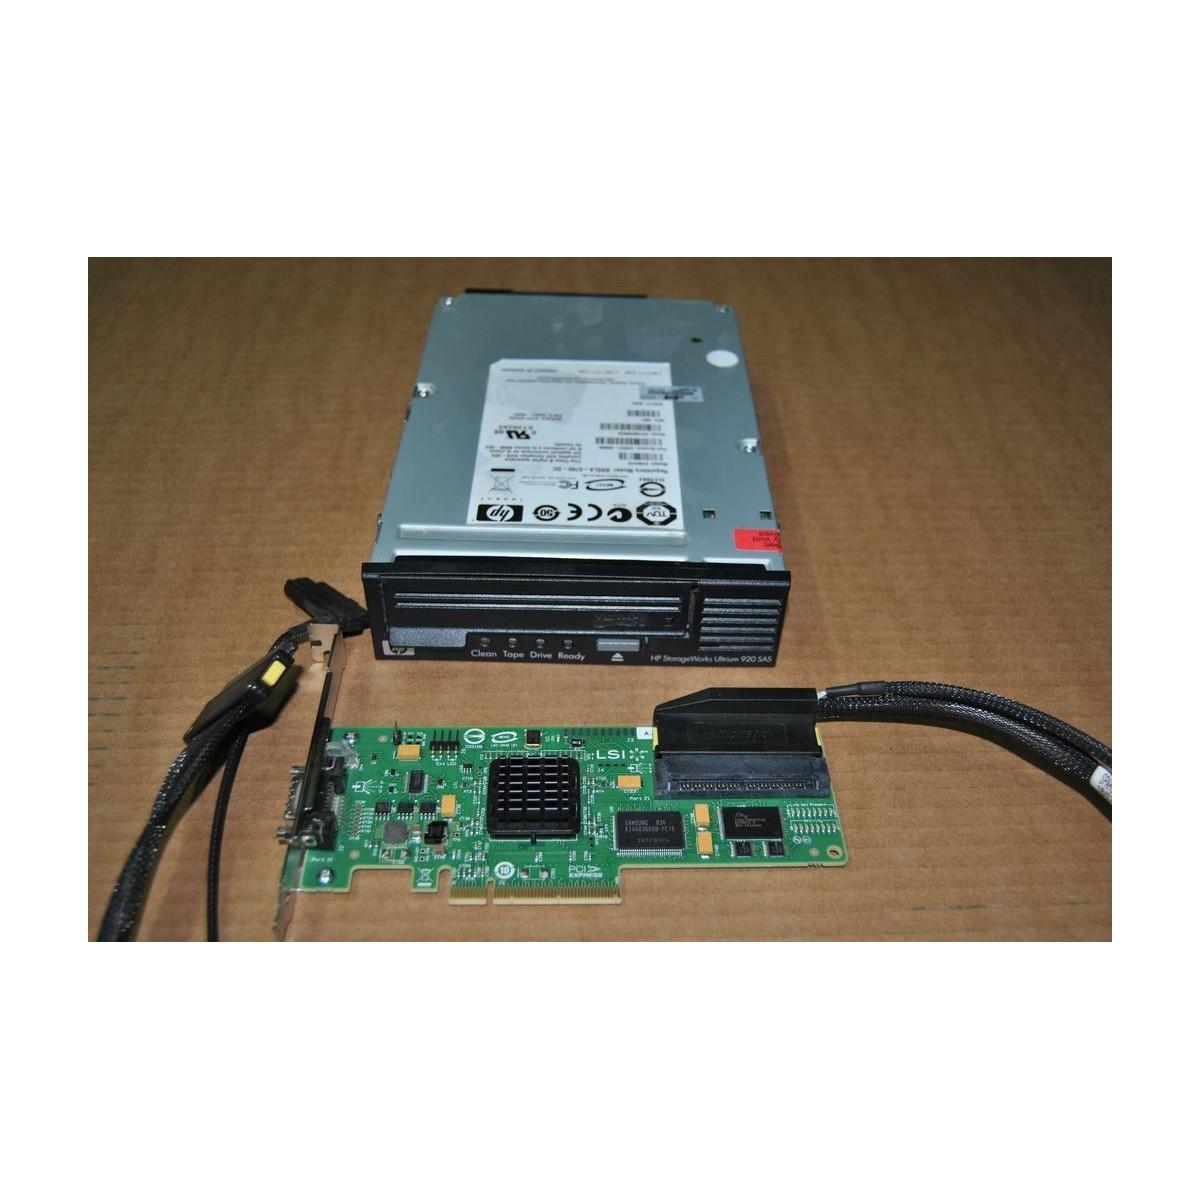 PAMIEC HYNIX 16GB DDR III PC3-8500R 4Rx4